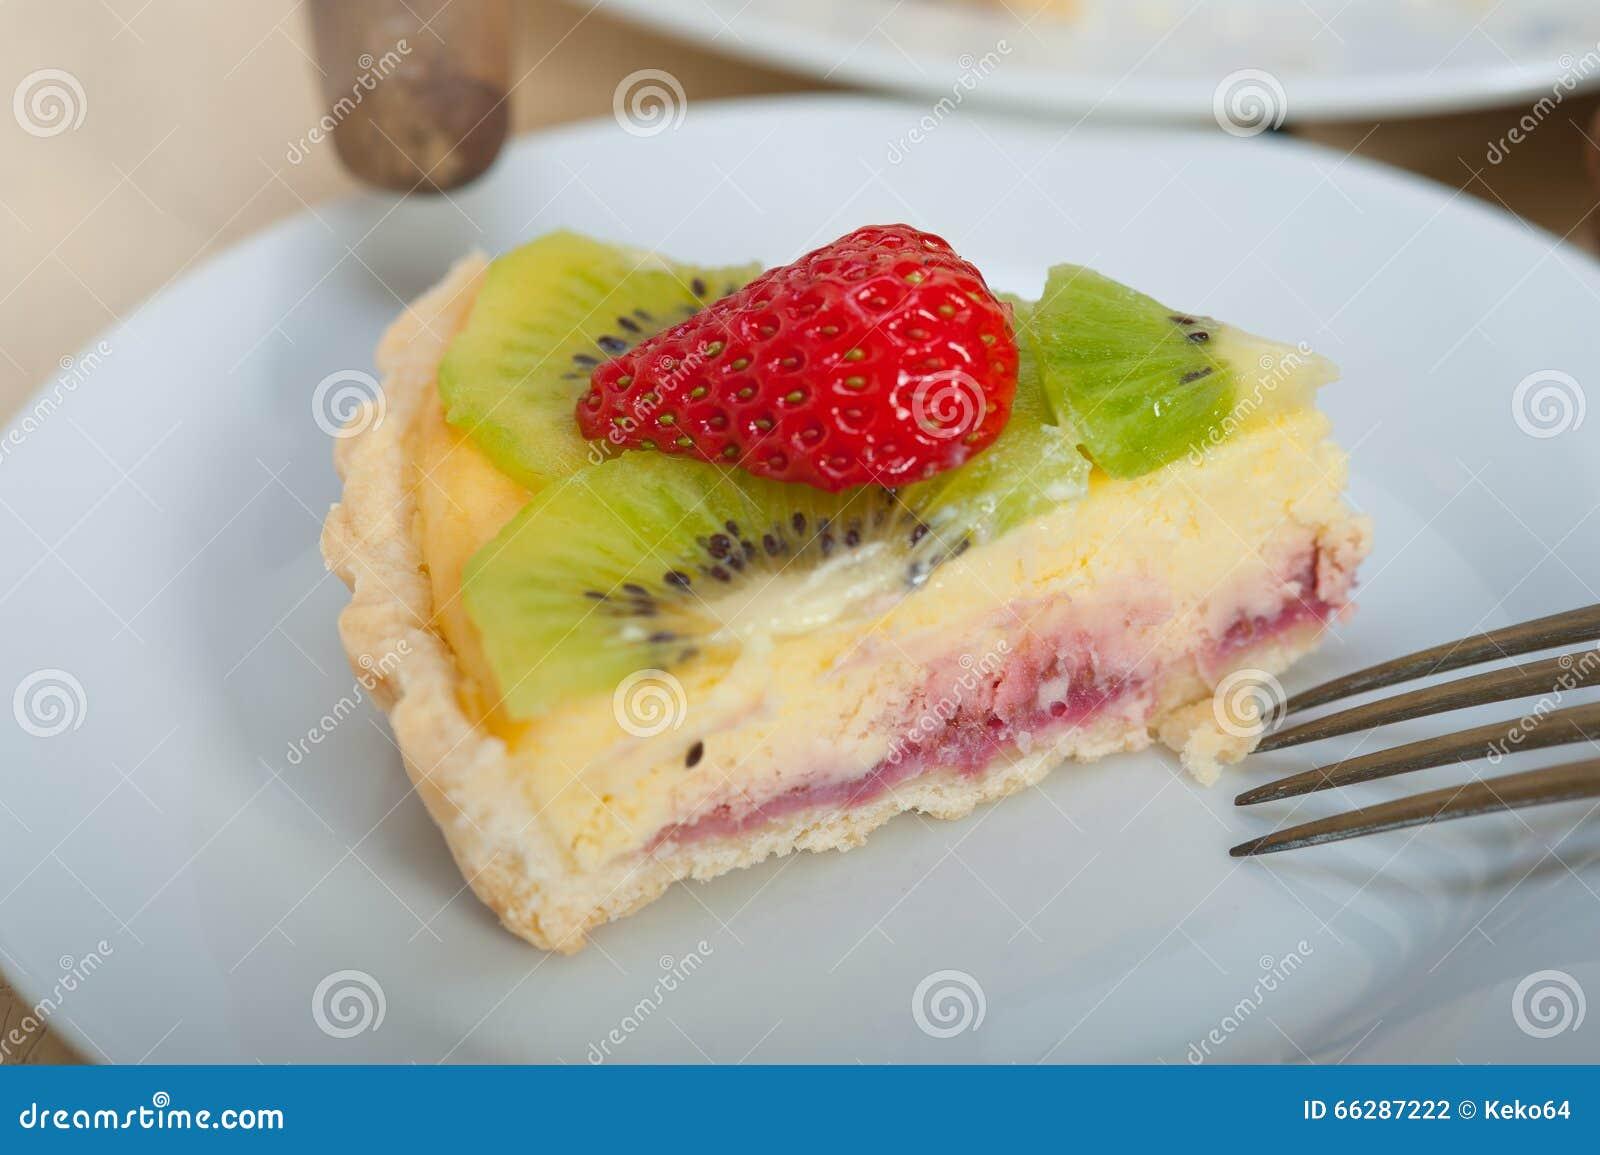 Kiwi And Strawberry Pie Tart Stock Photo - Image: 66287222